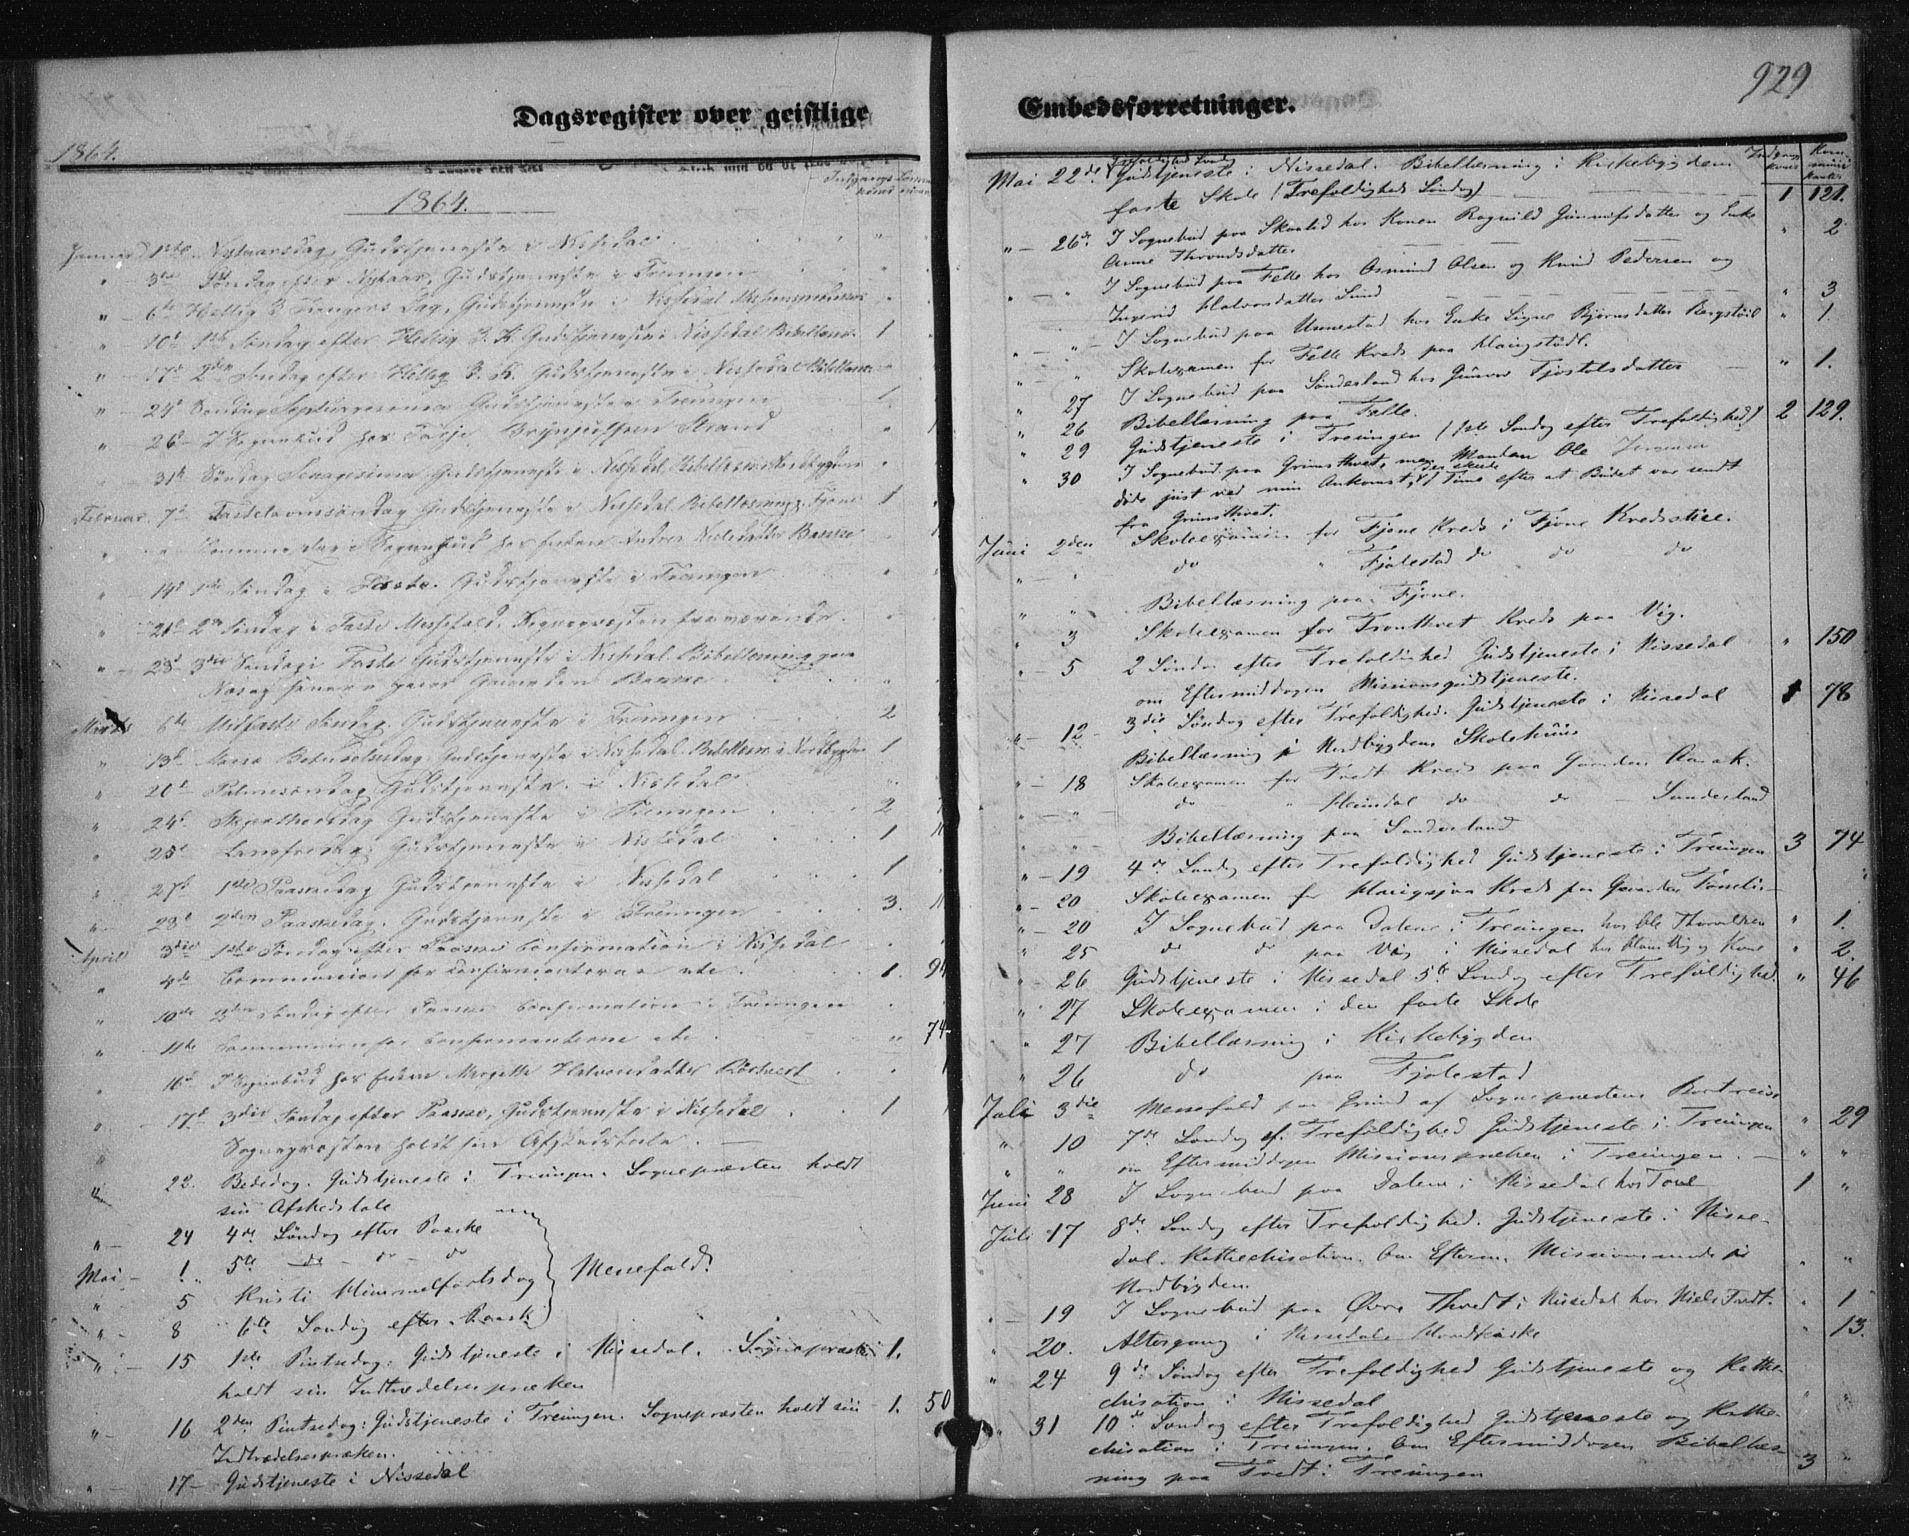 SAKO, Nissedal kirkebøker, F/Fa/L0003: Ministerialbok nr. I 3, 1846-1870, s. 928-929